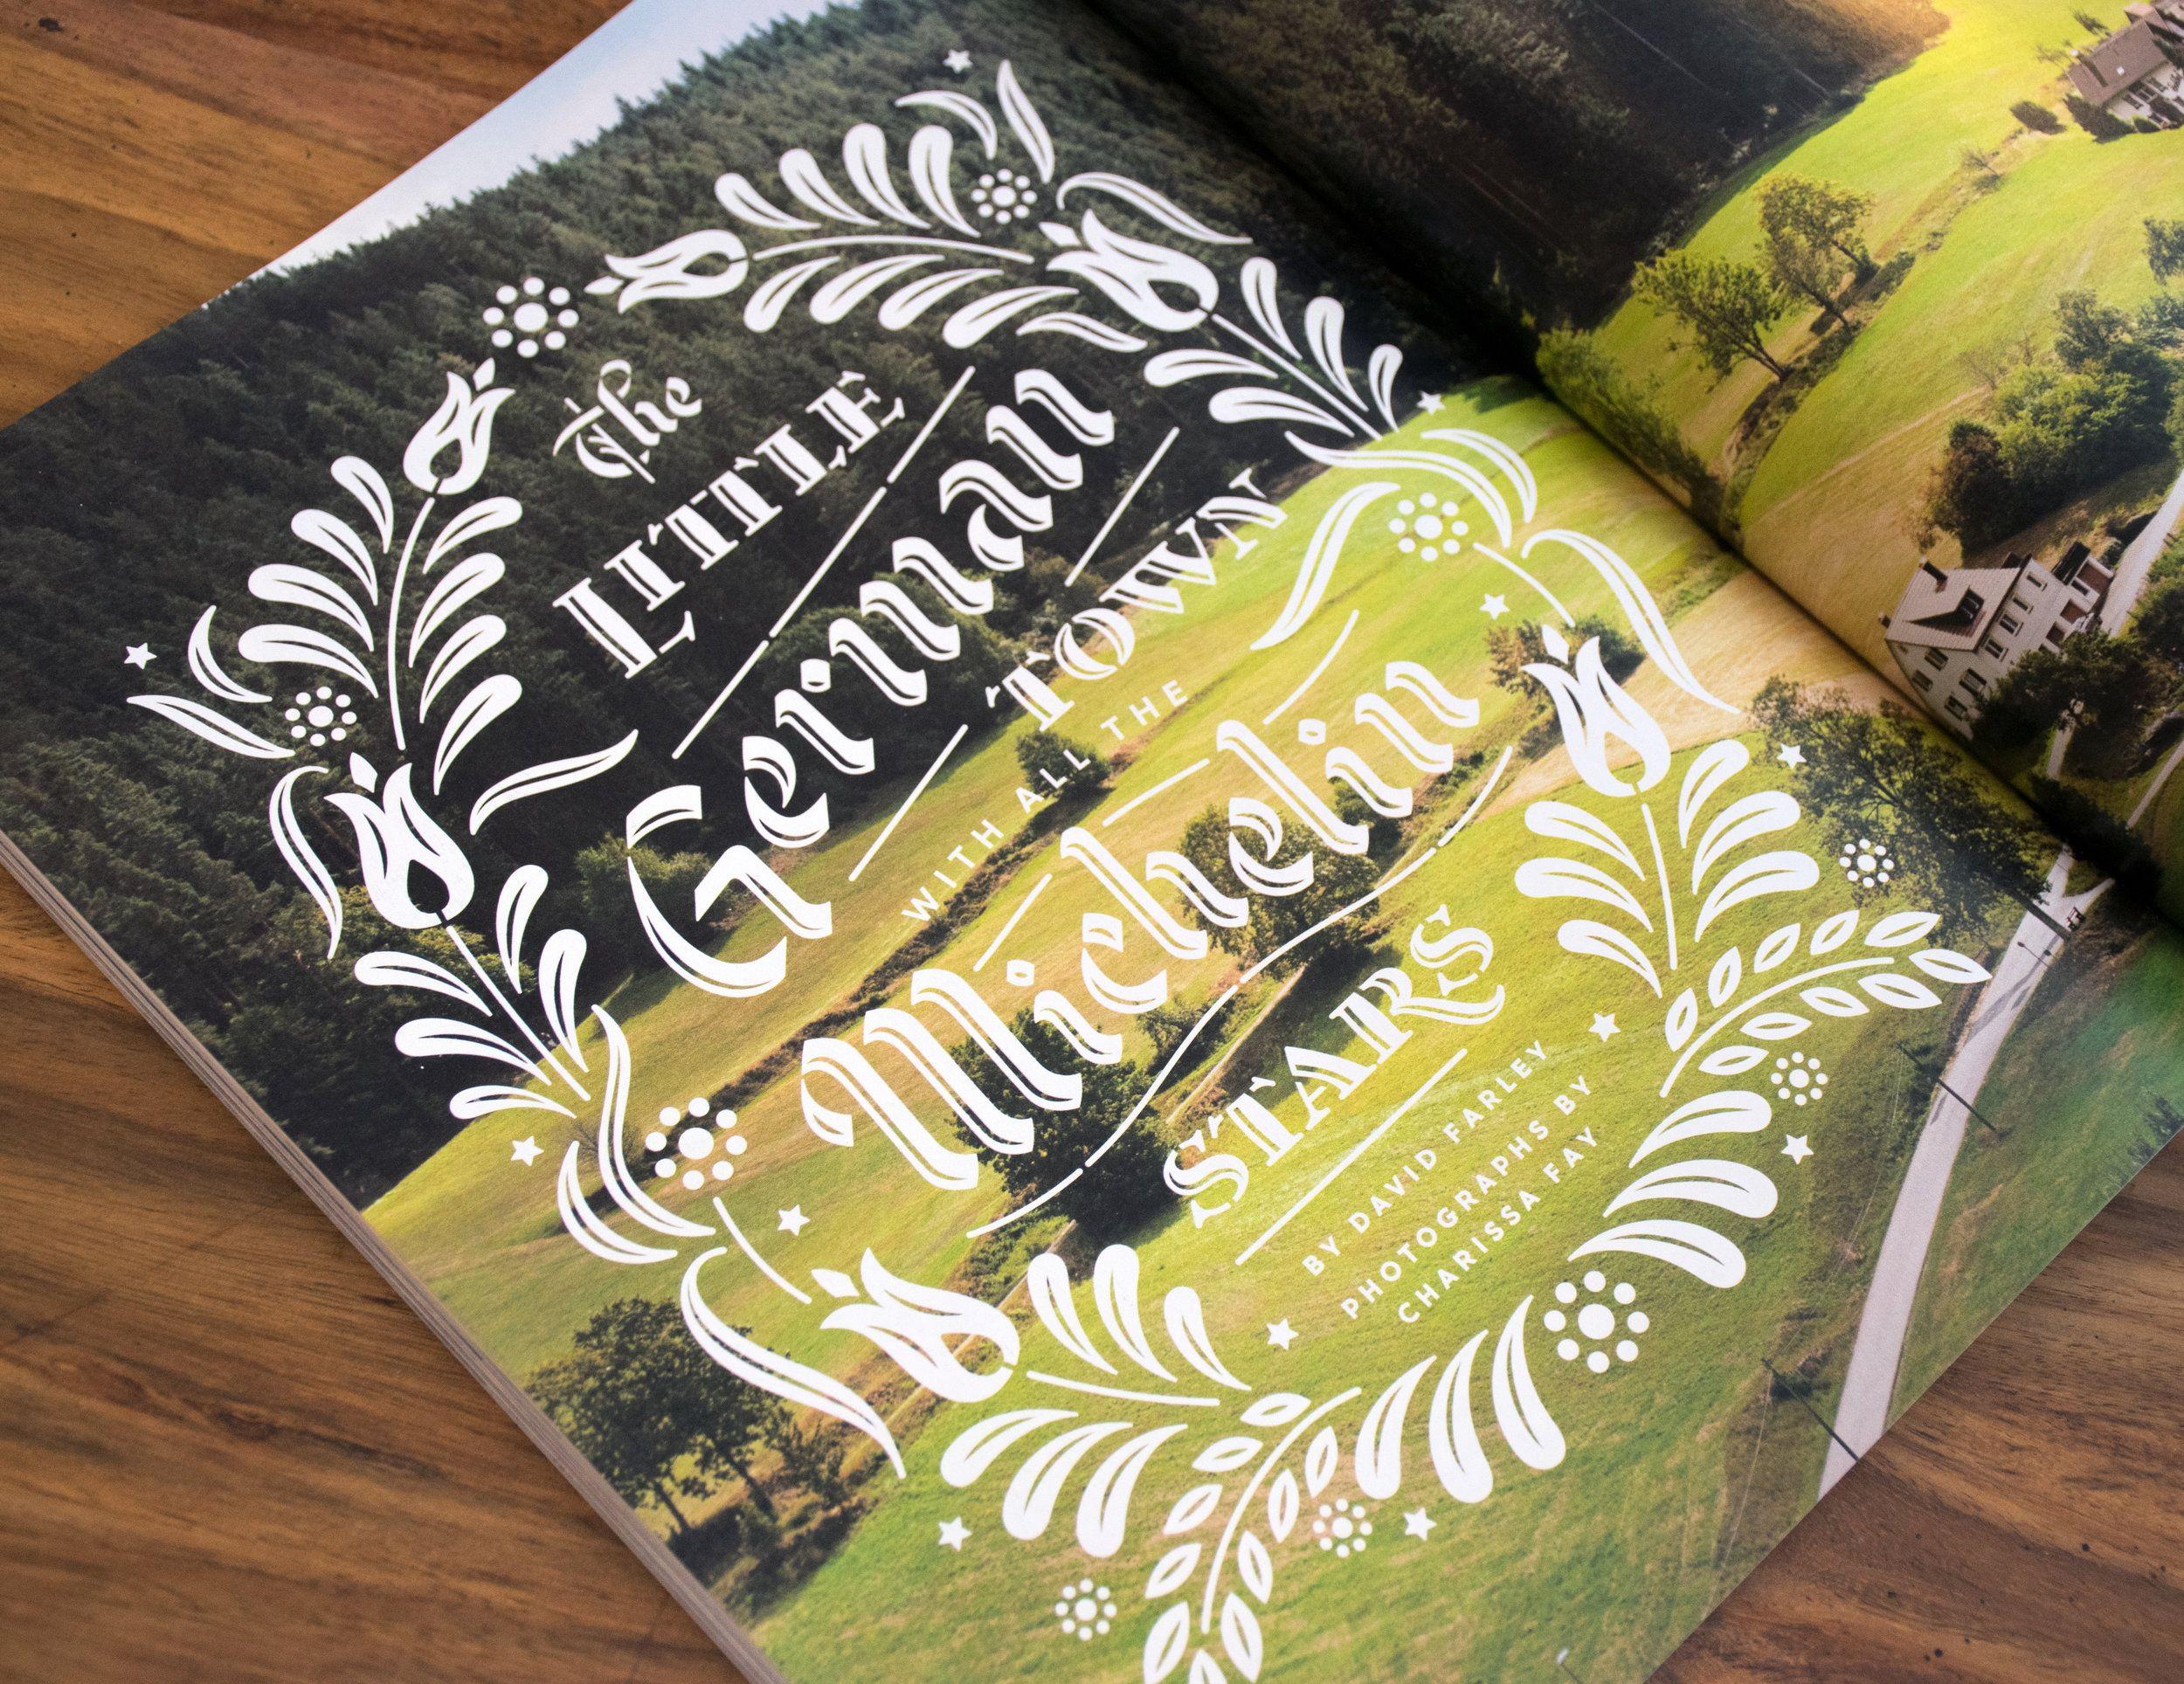 Chicken Printable Quotes: Pin By Arjan Van Woensel On Typogravy (finger Licking Good